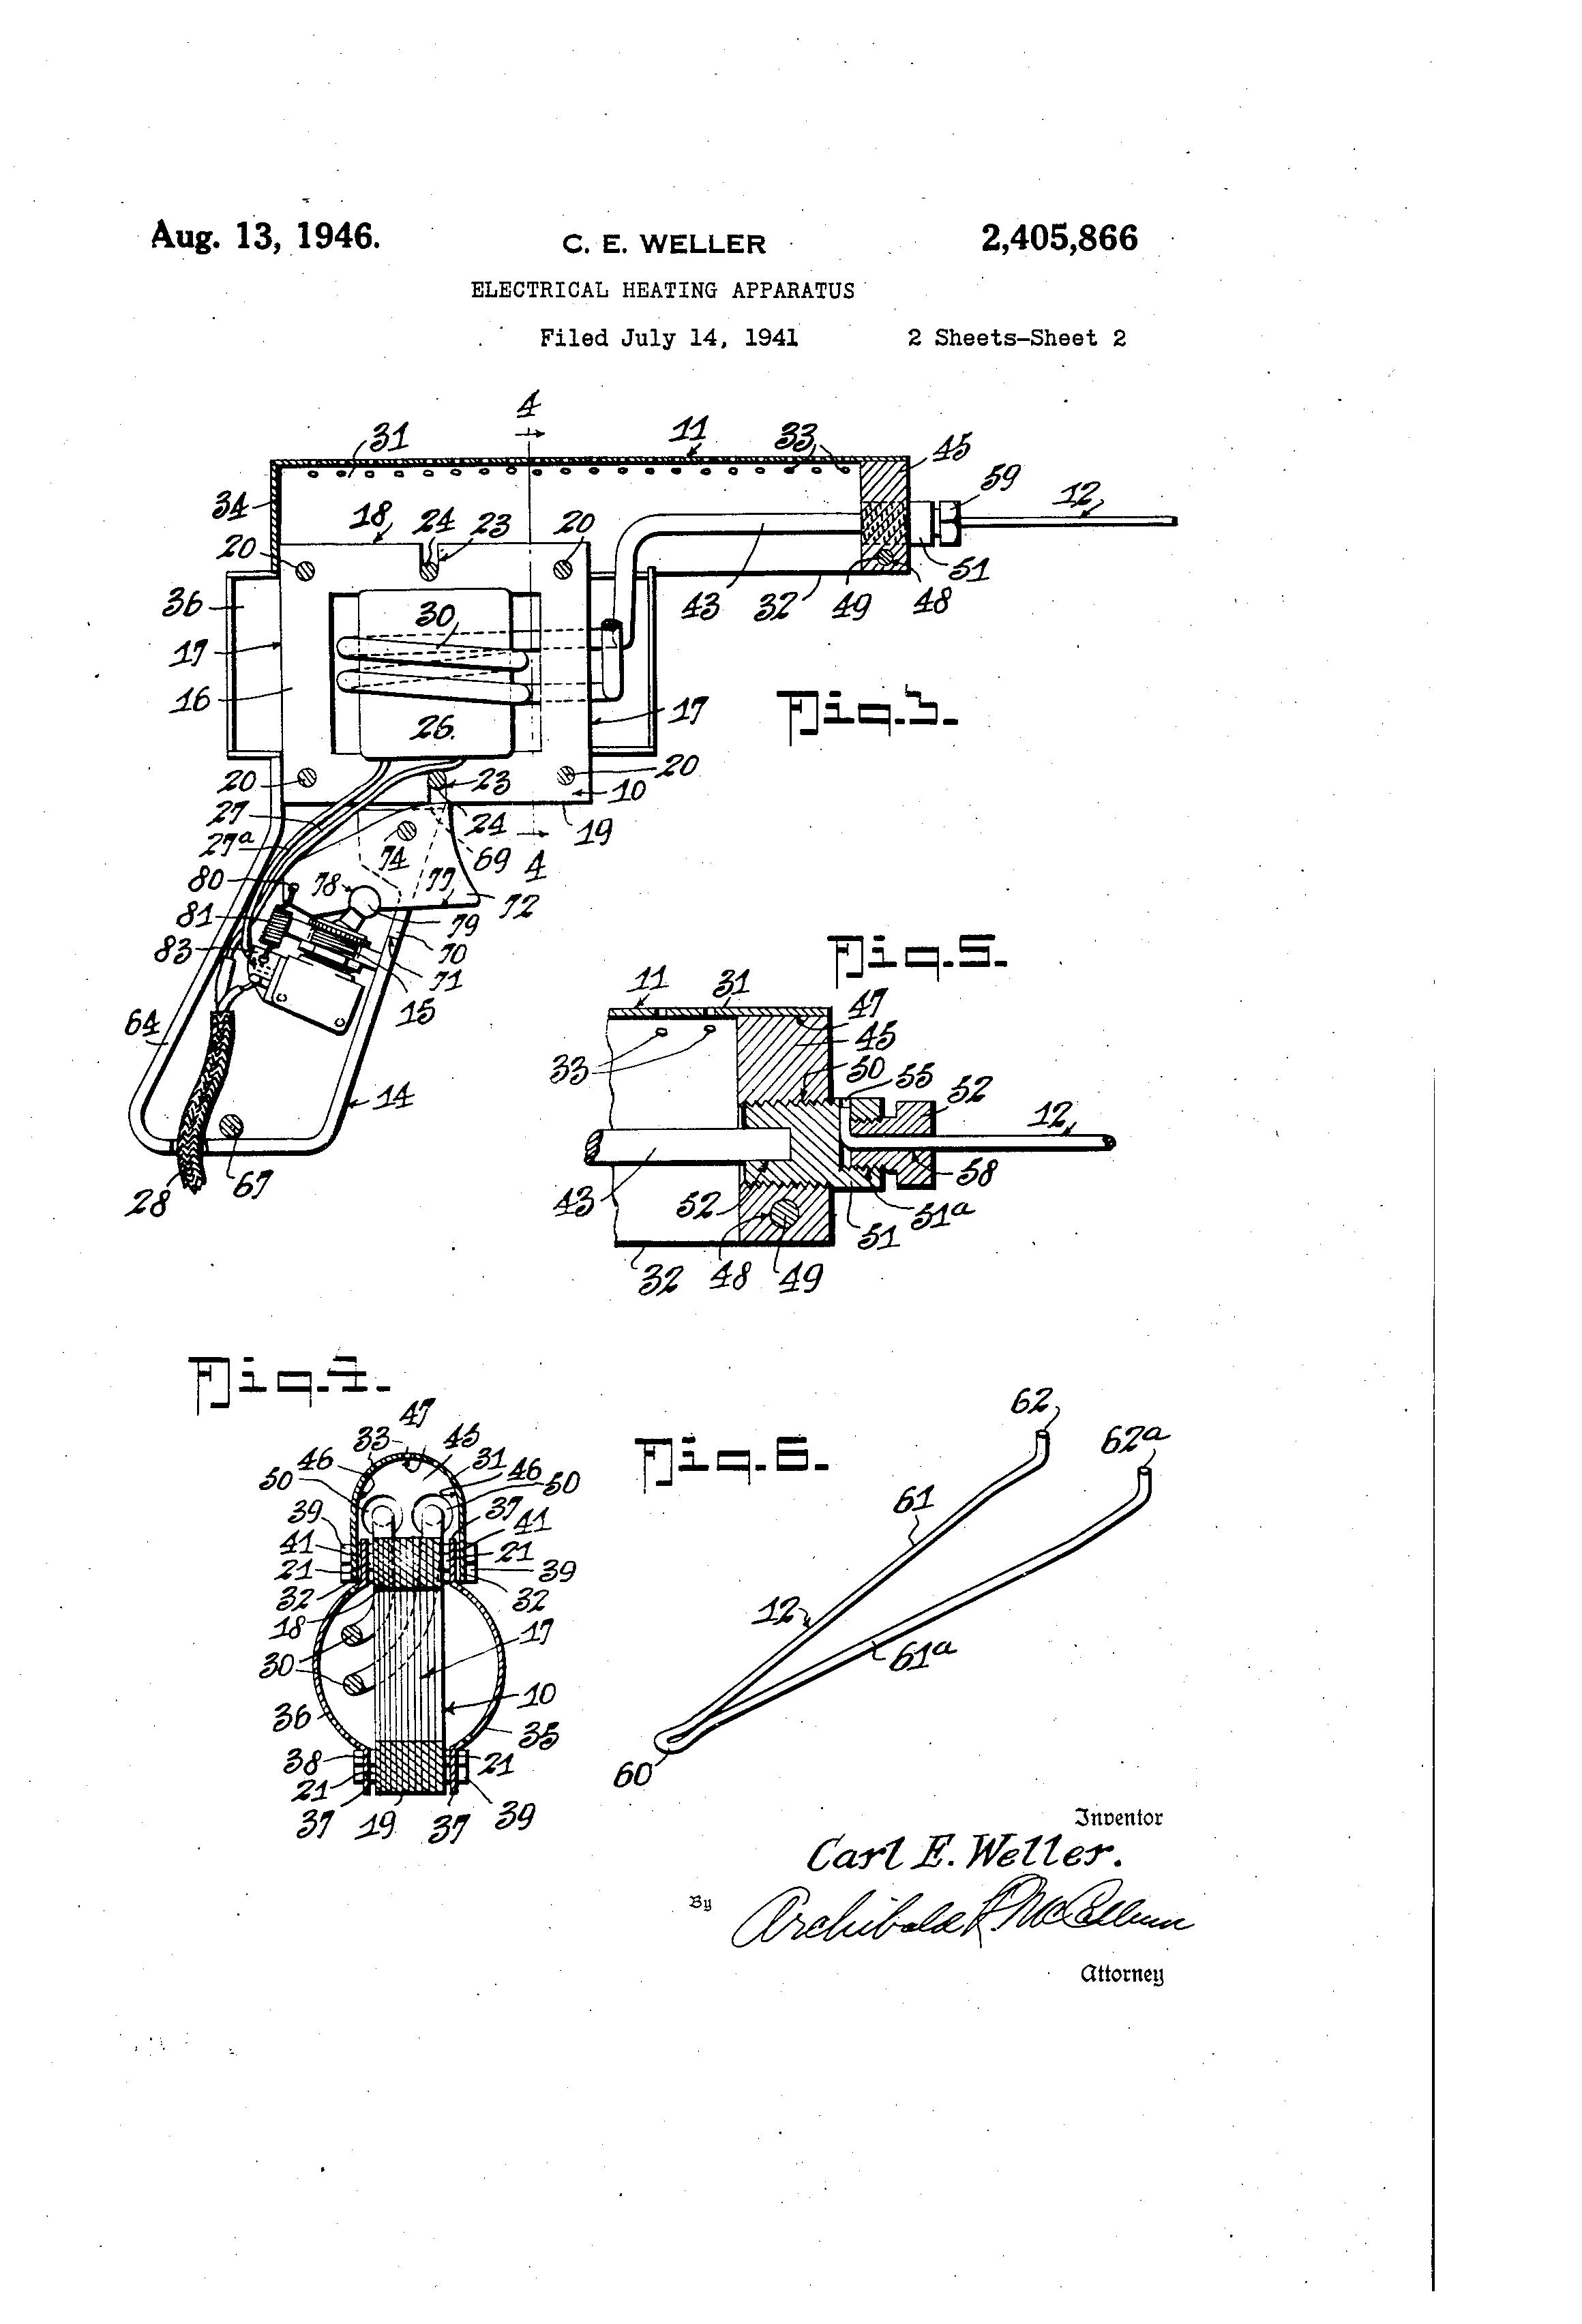 soldering gun patent drawing